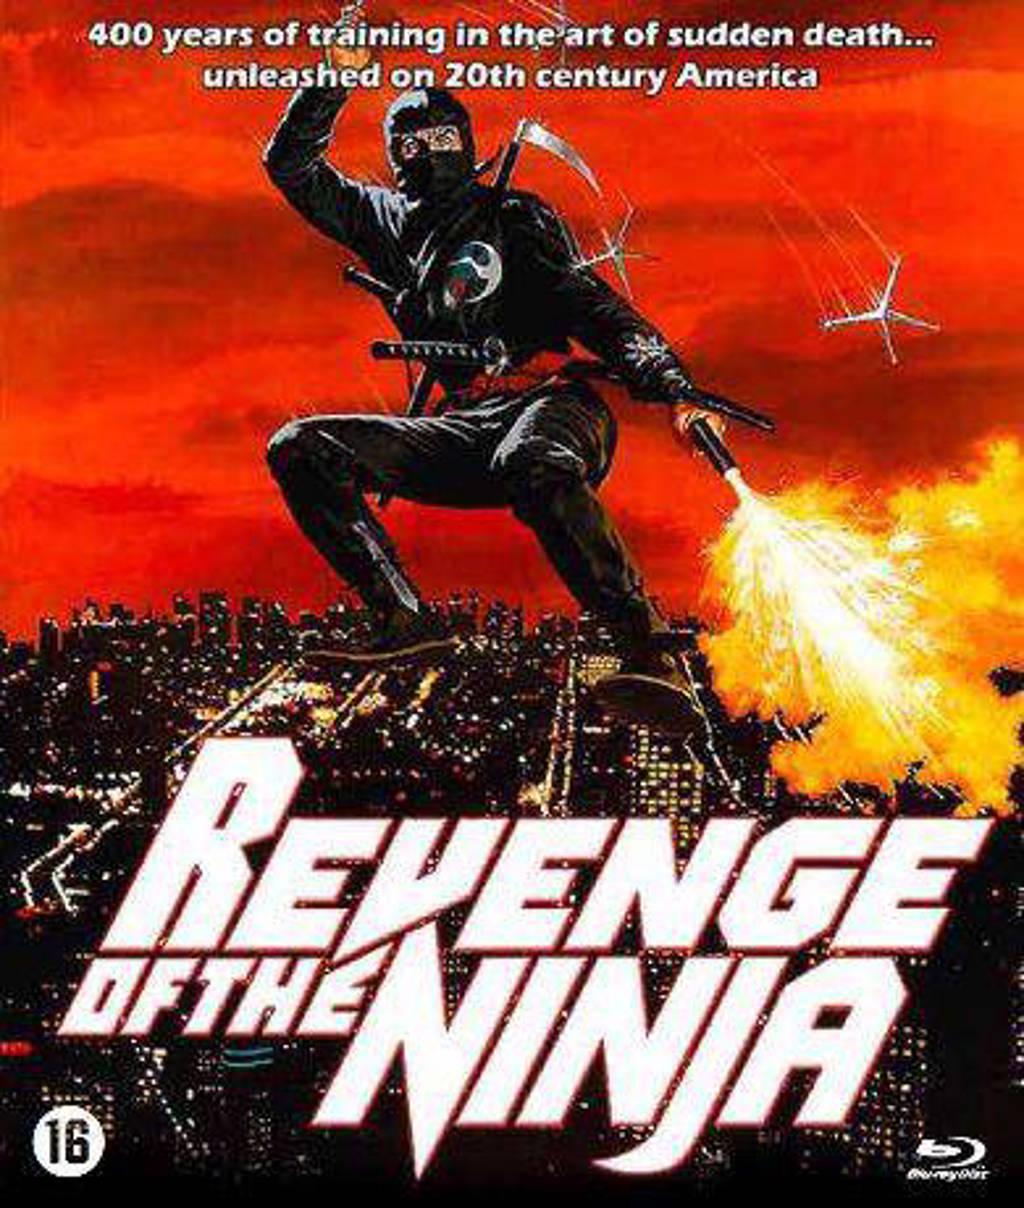 Revenge of the ninja (Blu-ray)